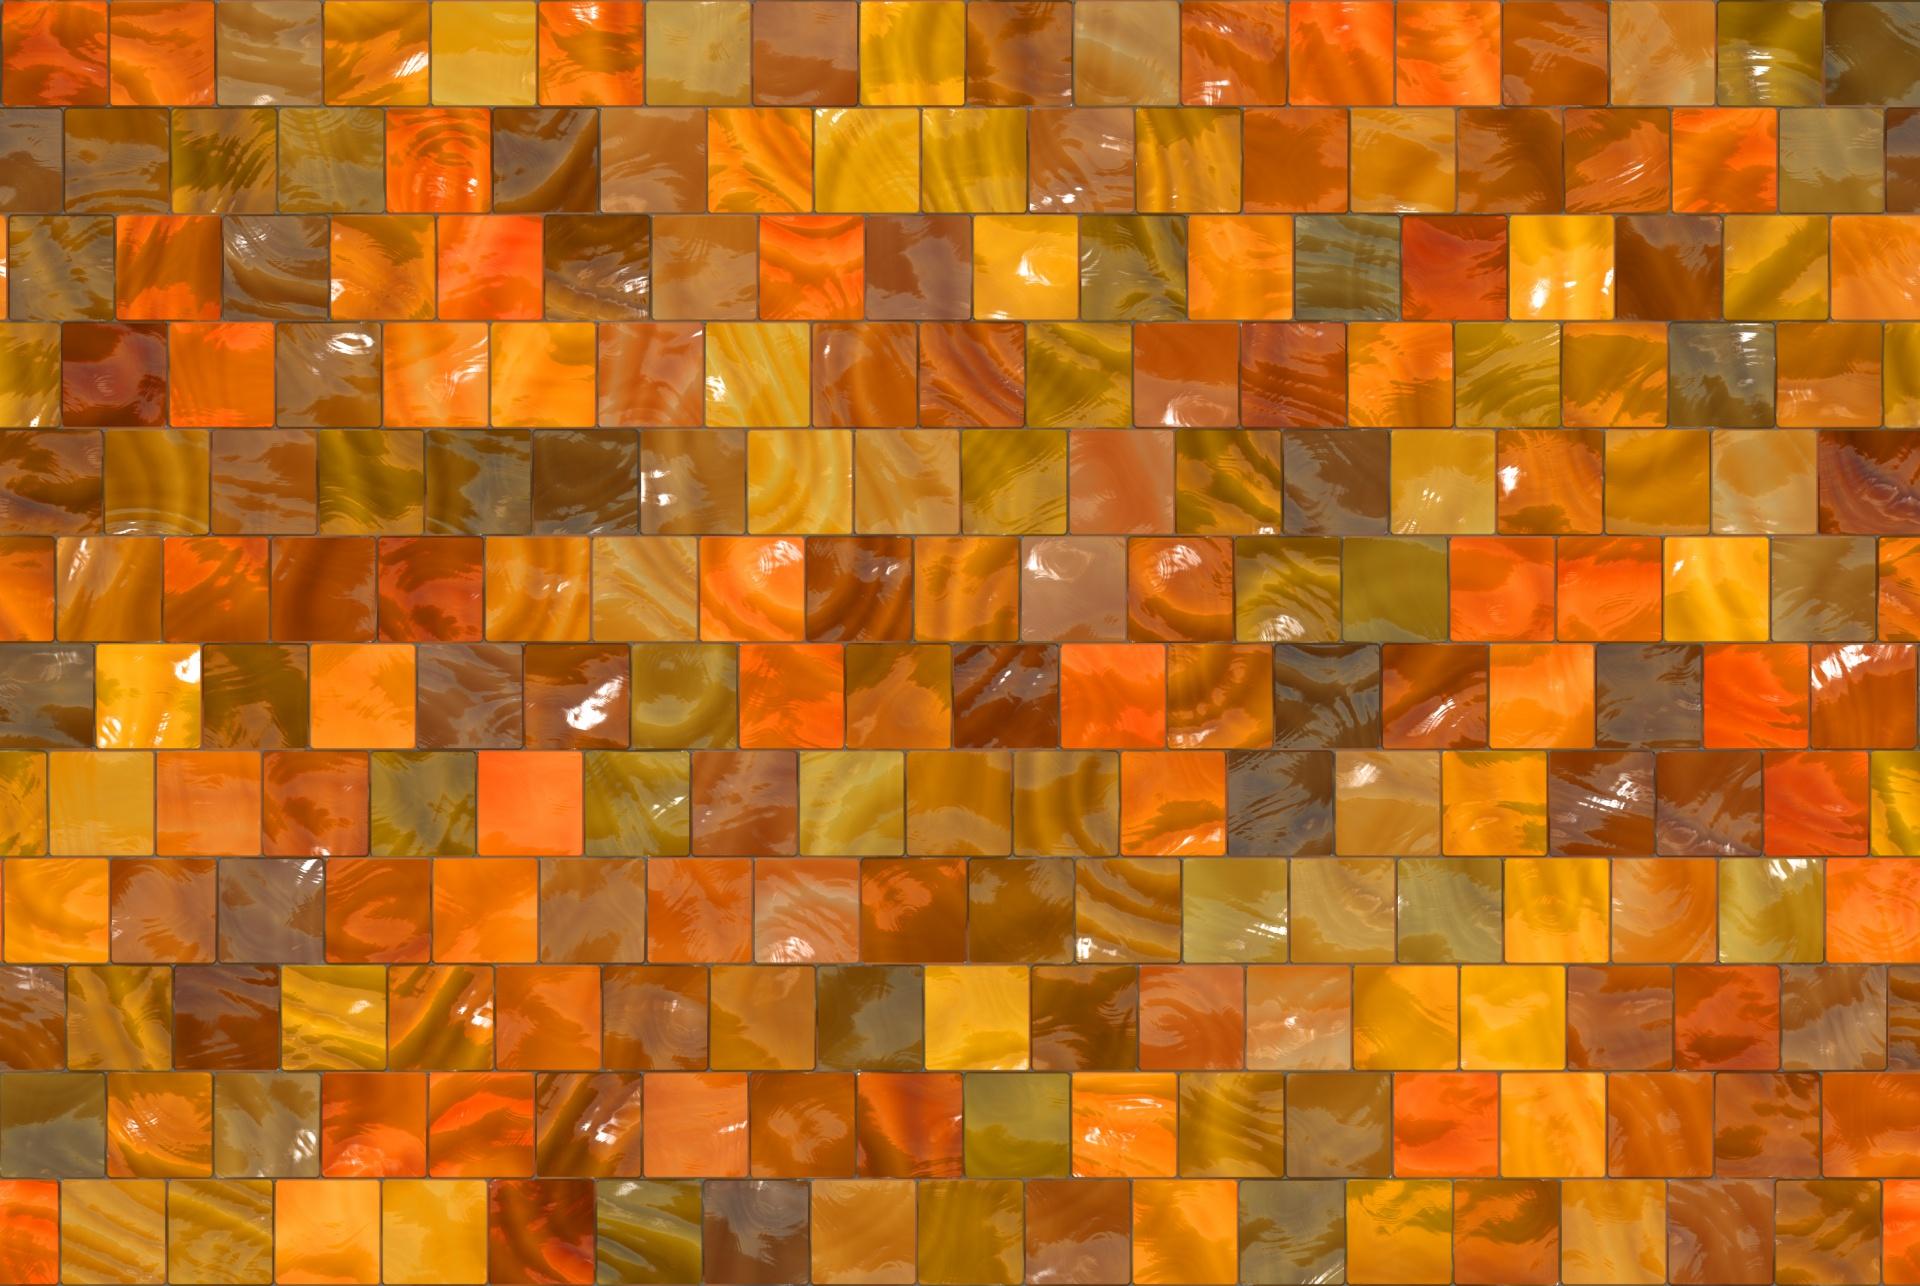 Fall Pattern Wallpaper Seamless Squares Autumn Background Free Stock Photo